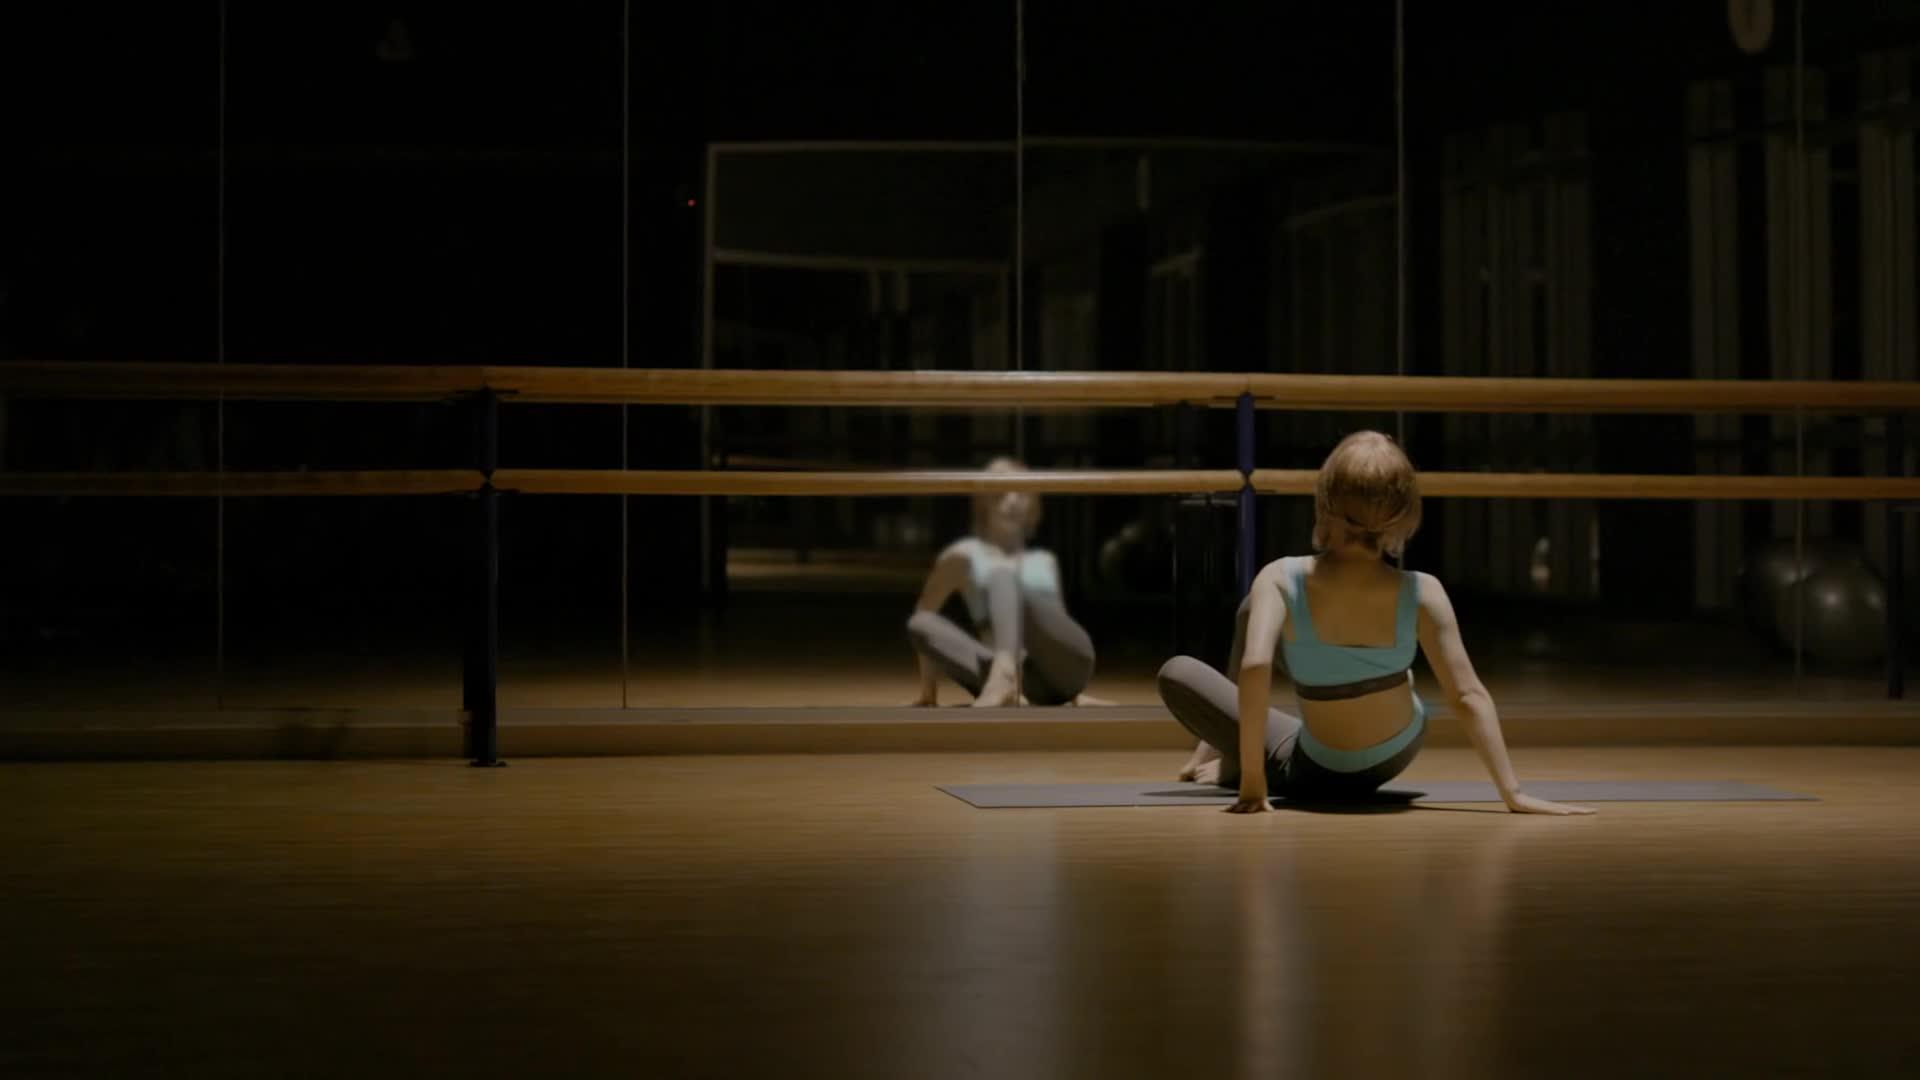 AOA, Choa, Choaya, Commercial, Ellesse, Fitness, Park Choa, Yoga, Choa doing yoga stretches - Ellesse CF GIFs